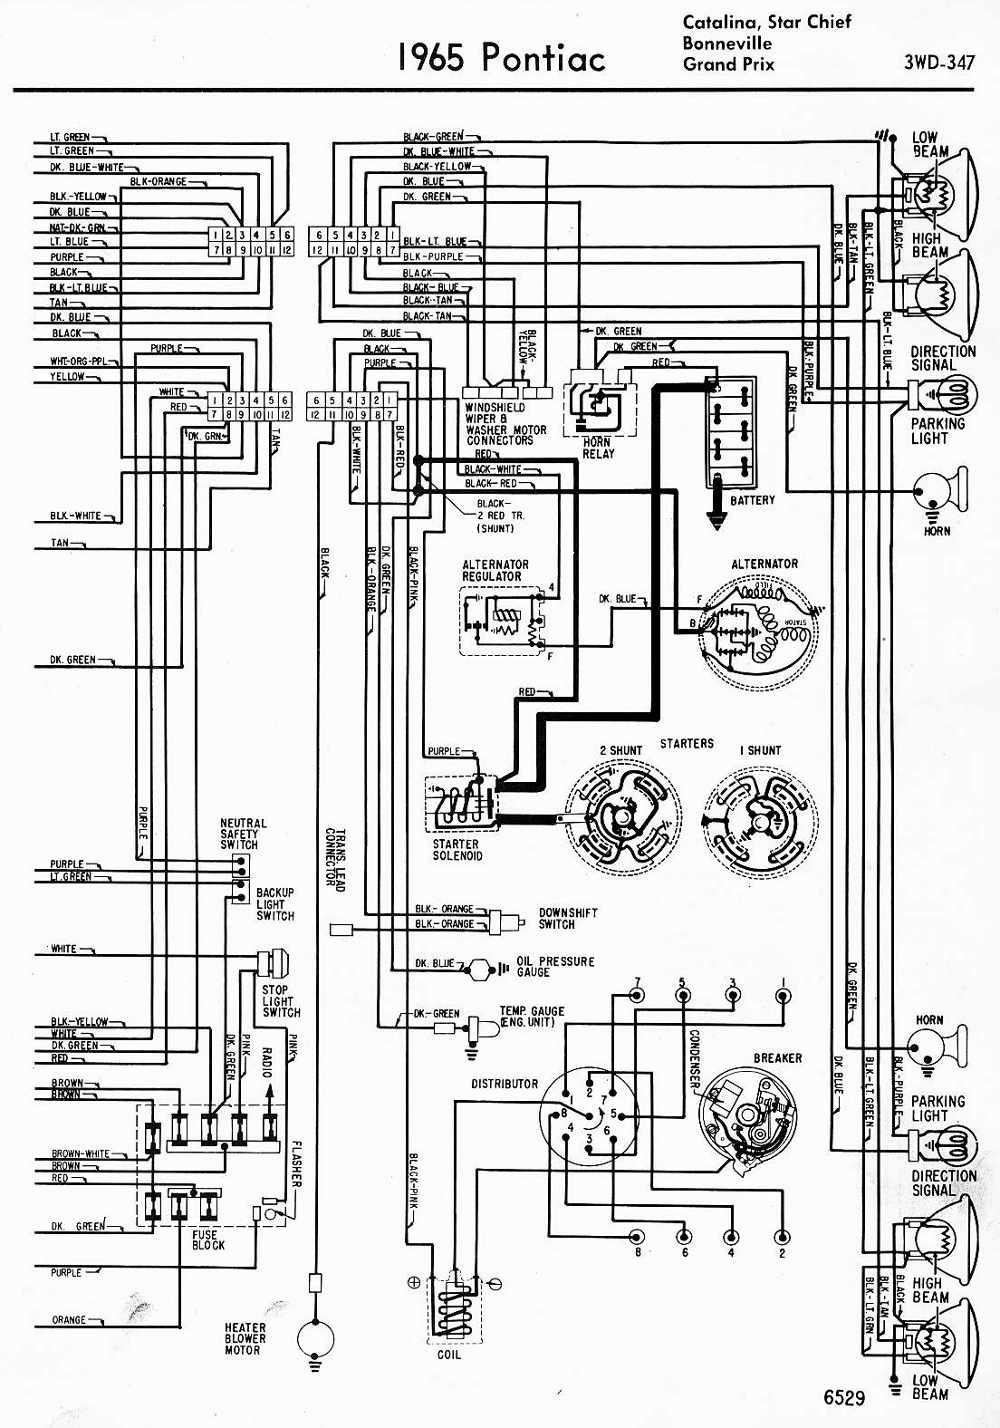 Wiring Diagram For 2000 Pontiac Bonneville - Wiring Diagram Server  fur-answer - fur-answer.ristoranteitredenari.it | Wiring Diagram For 2000 Pontiac Bonneville |  | Ristorante I Tre Denari Manerbio